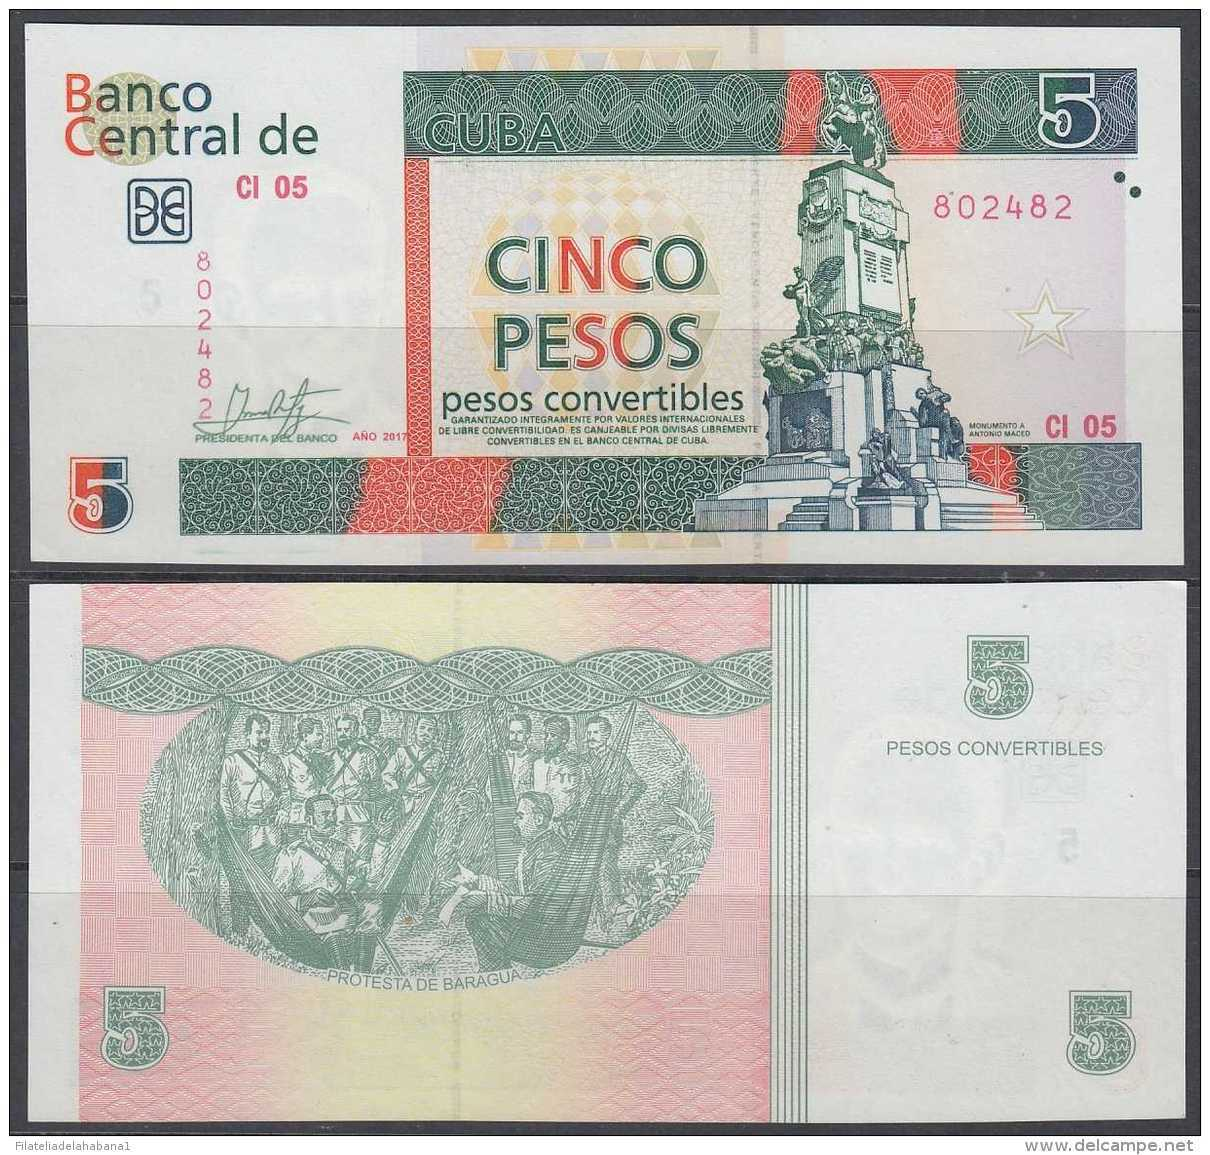 2017-BK-2 CUBA 2017 5$ Cuc UNC ANTONIO MACEO. - Cuba